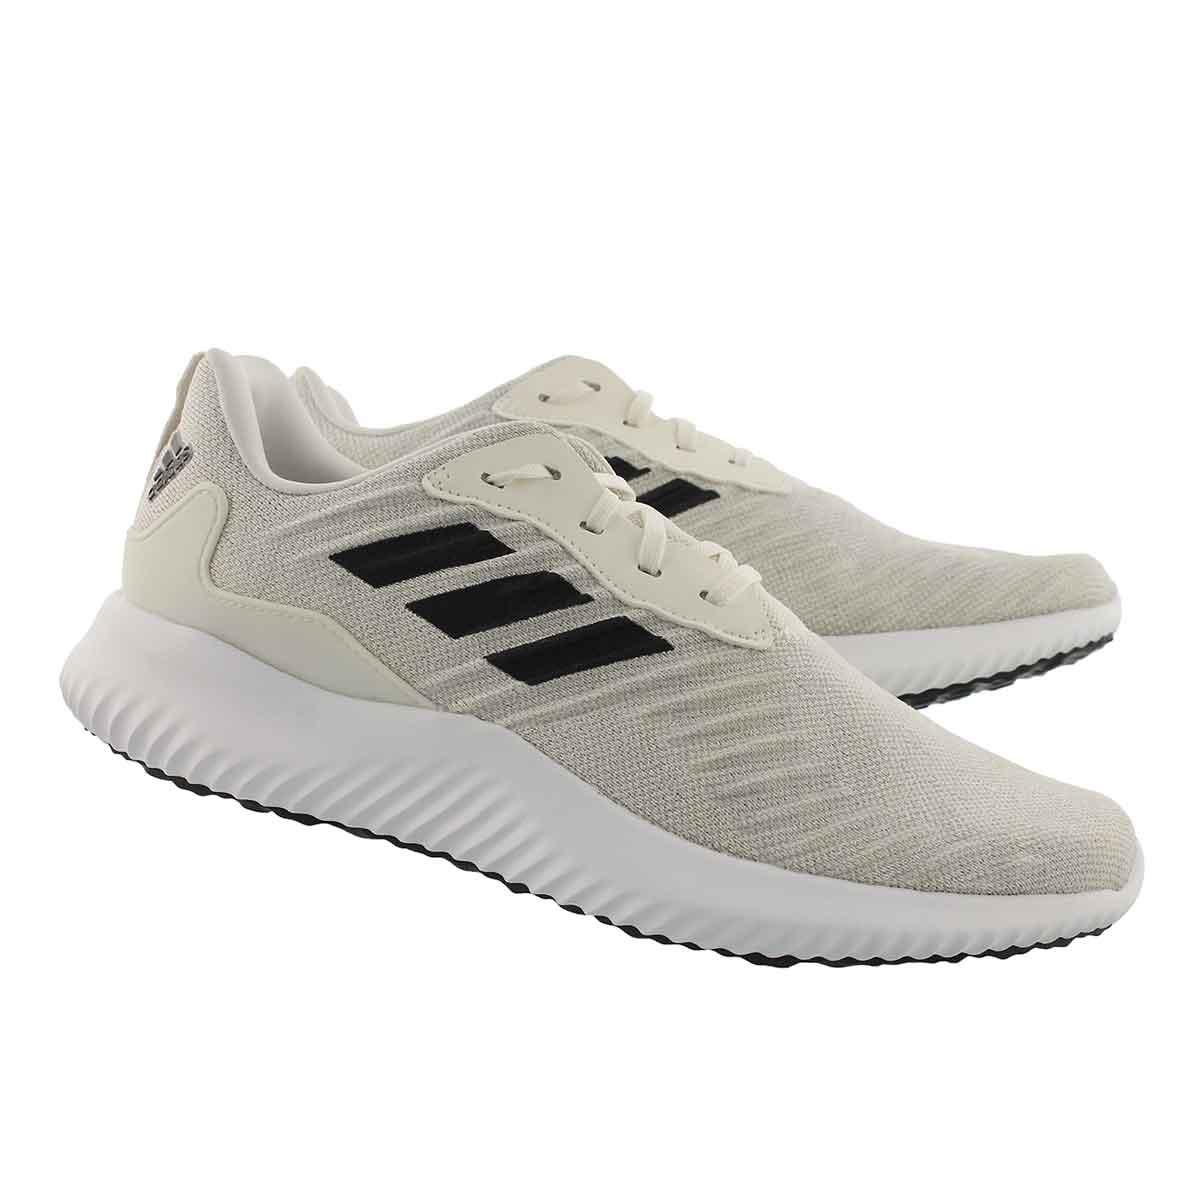 Mns Alphabounce RC wht/blk running shoe